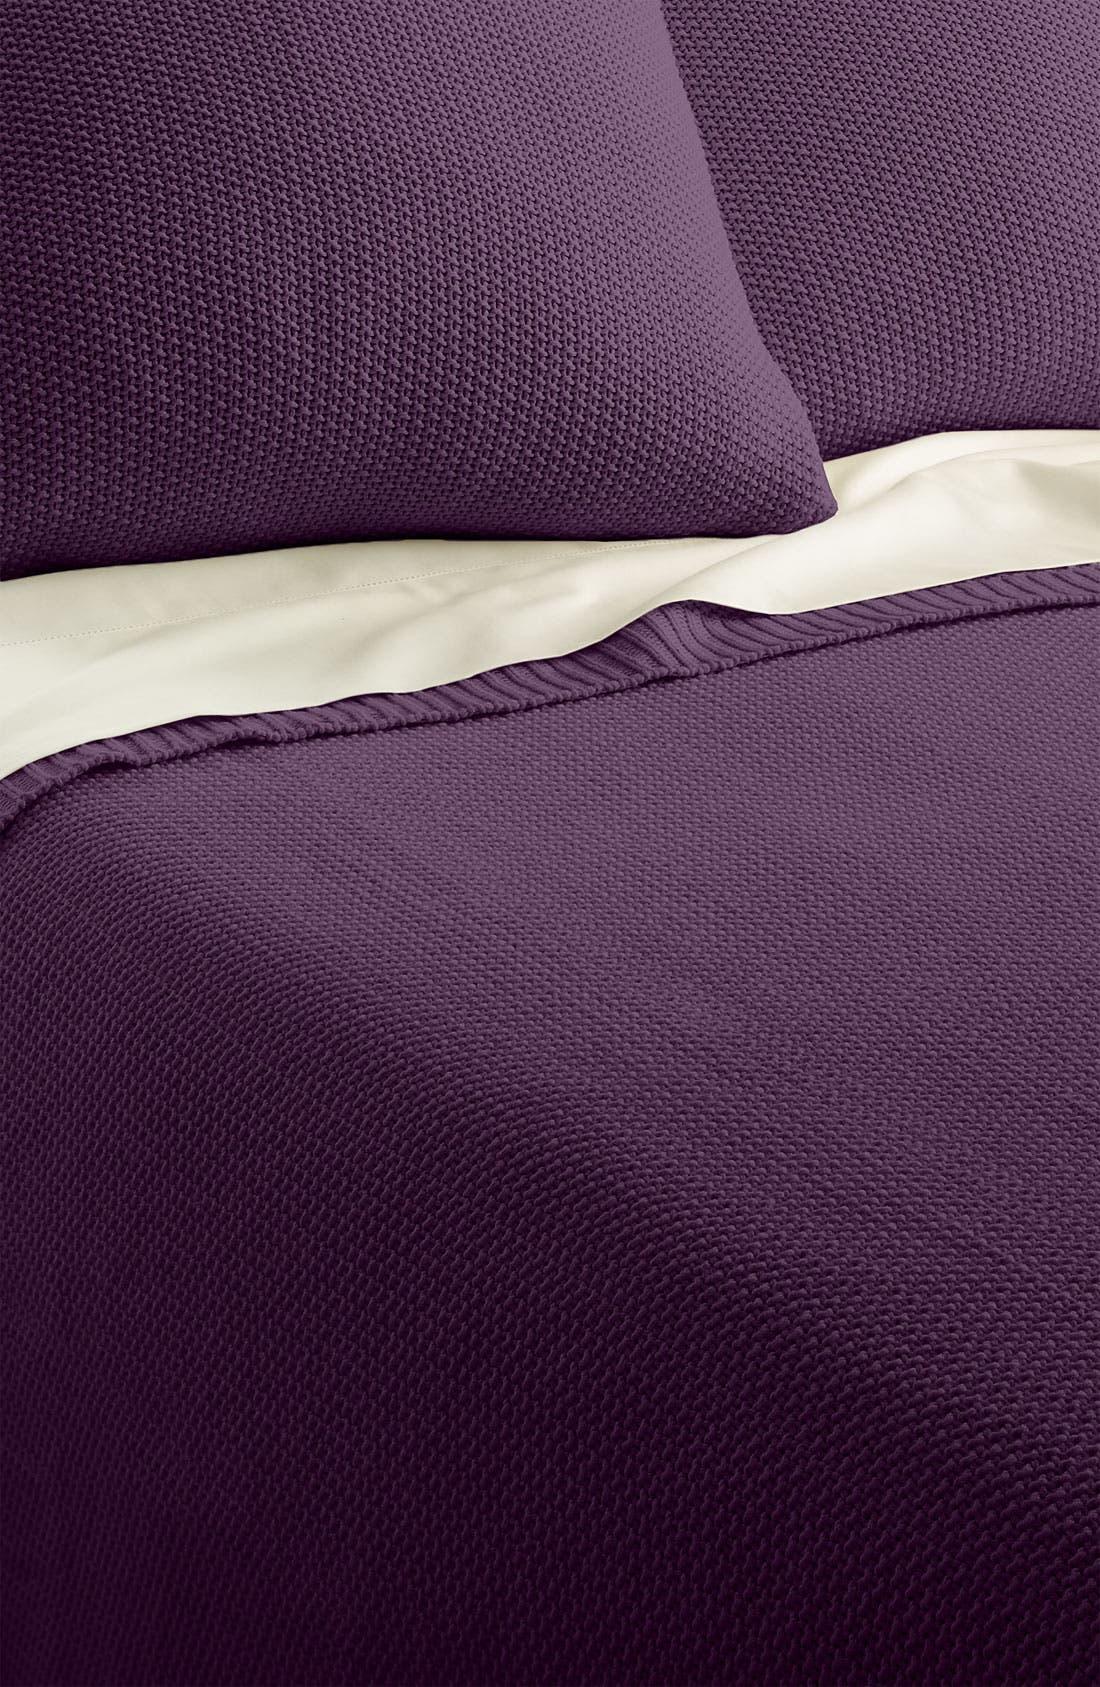 Alternate Image 1 Selected - Diane von Furstenberg 'Nirvana' Knit Blanket